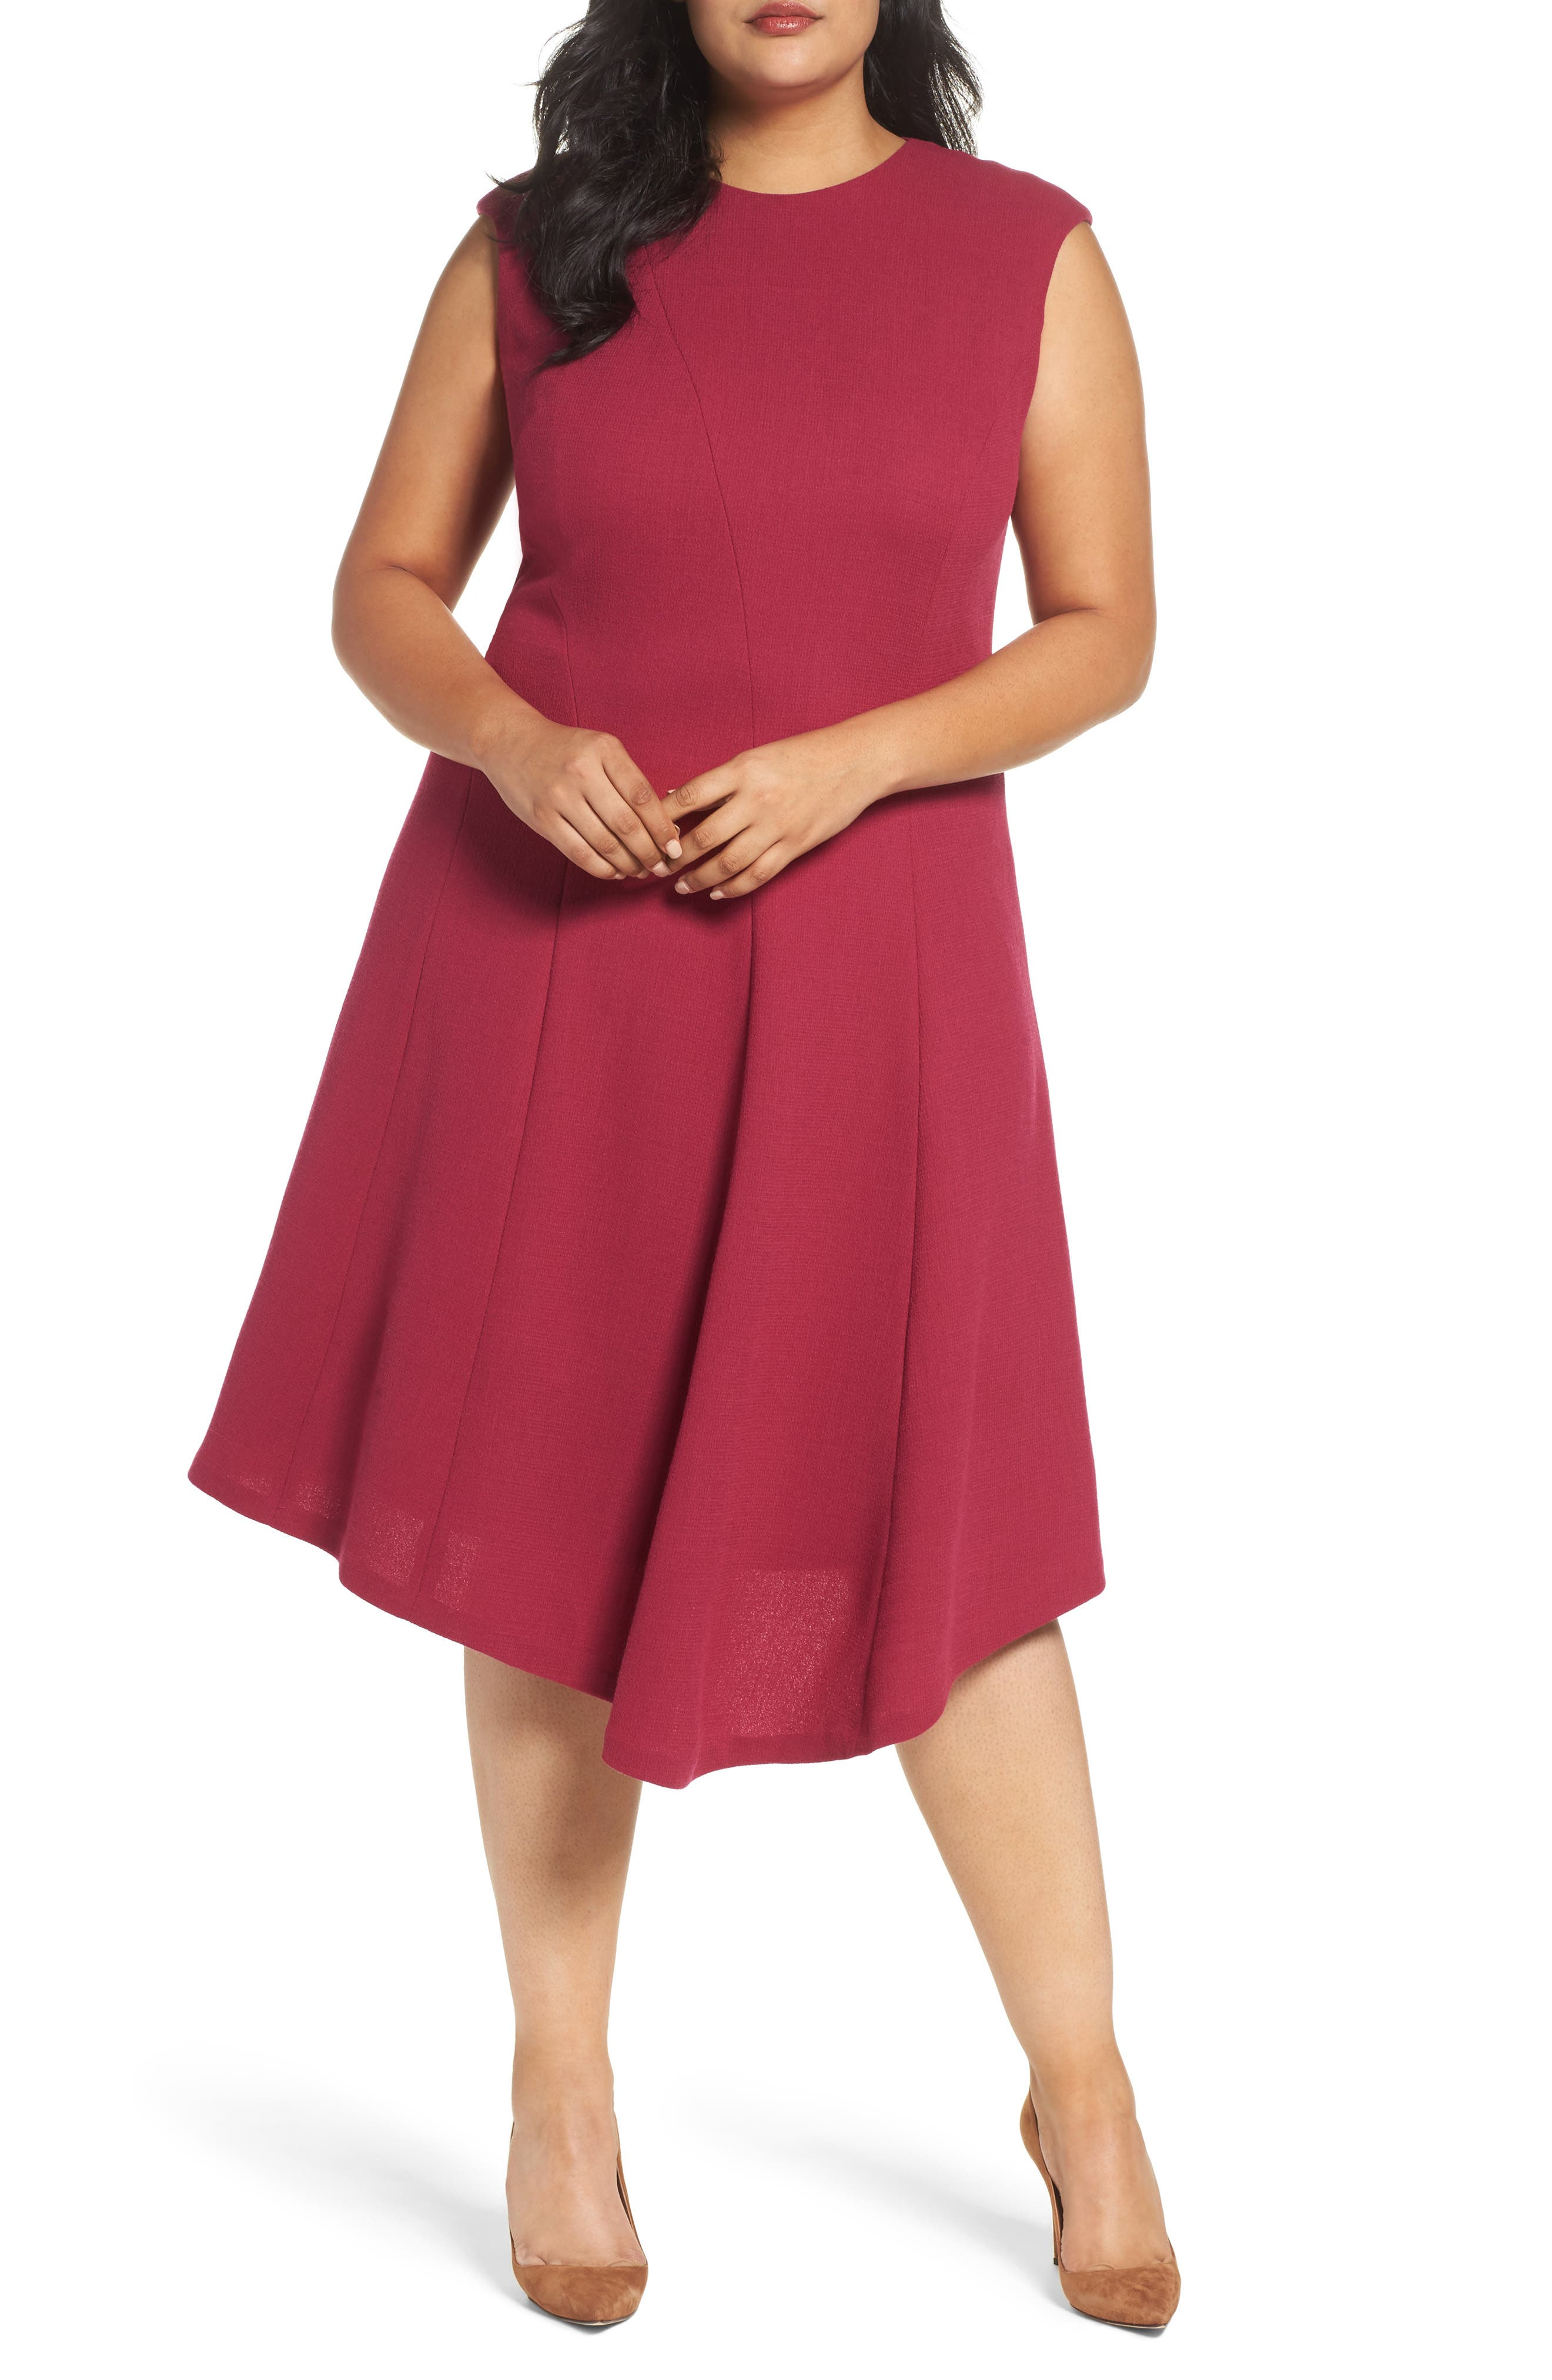 Alternate Image 1 Selected - Lafayette 148 New York Aveena Wool Interlock Dress (Plus Size)